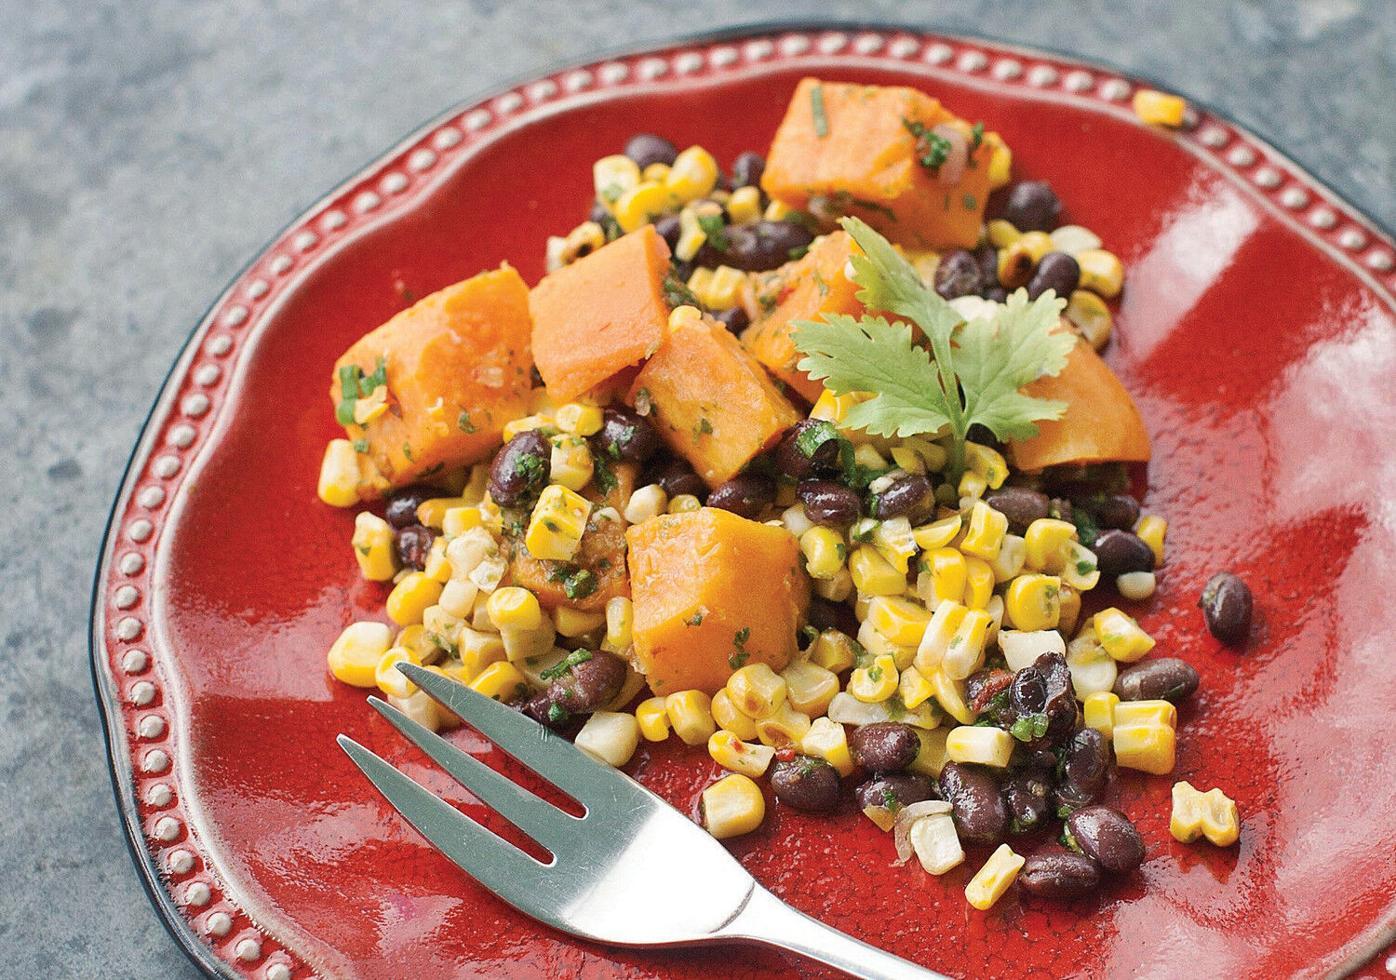 CORN AND BLACK BEAN SALAD: A veggie-packed summer dish